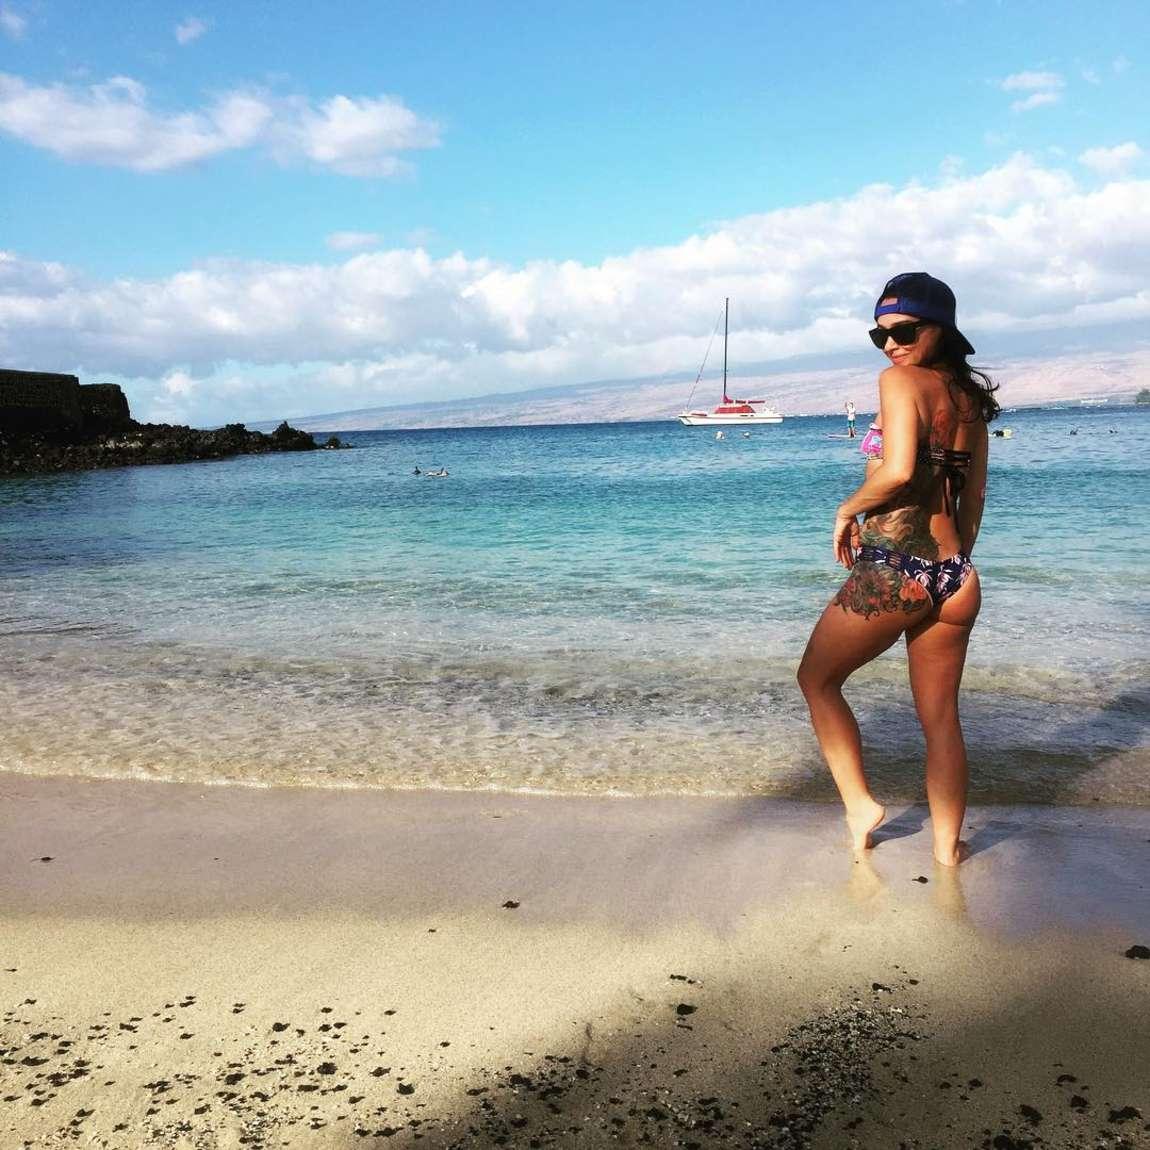 Water park bikini booty 15